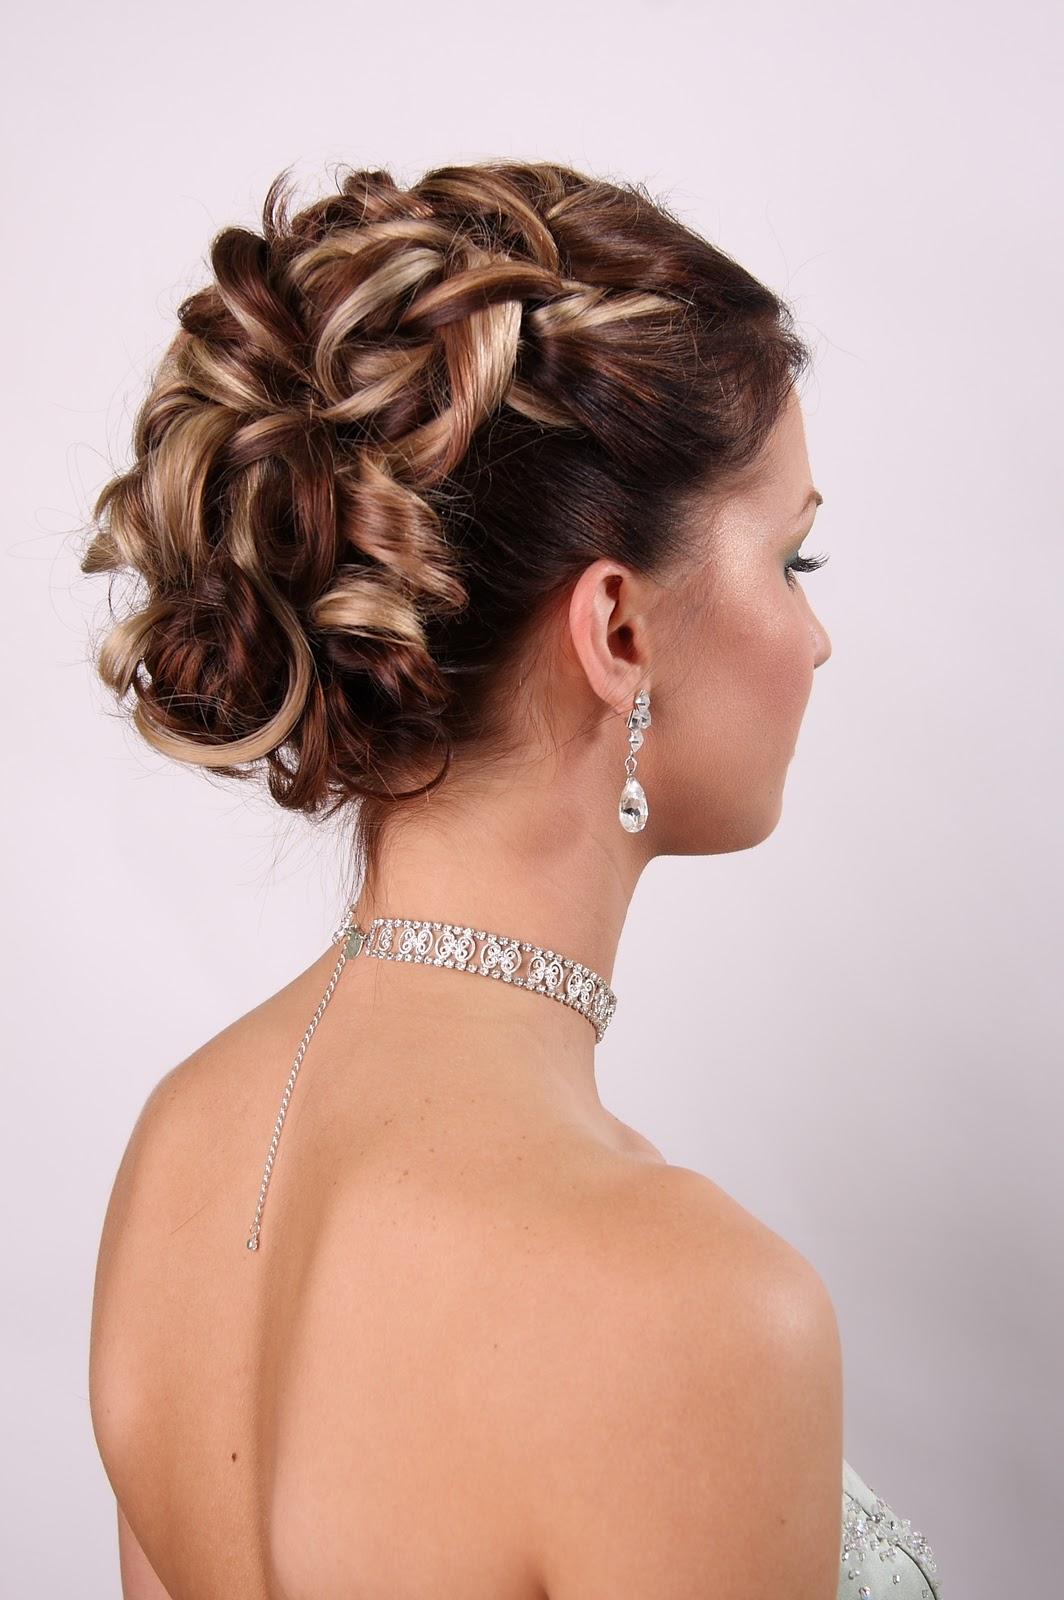 Awe Inspiring Wedding Hair Updos For Short Hair Hairstyle Inspiration Daily Dogsangcom